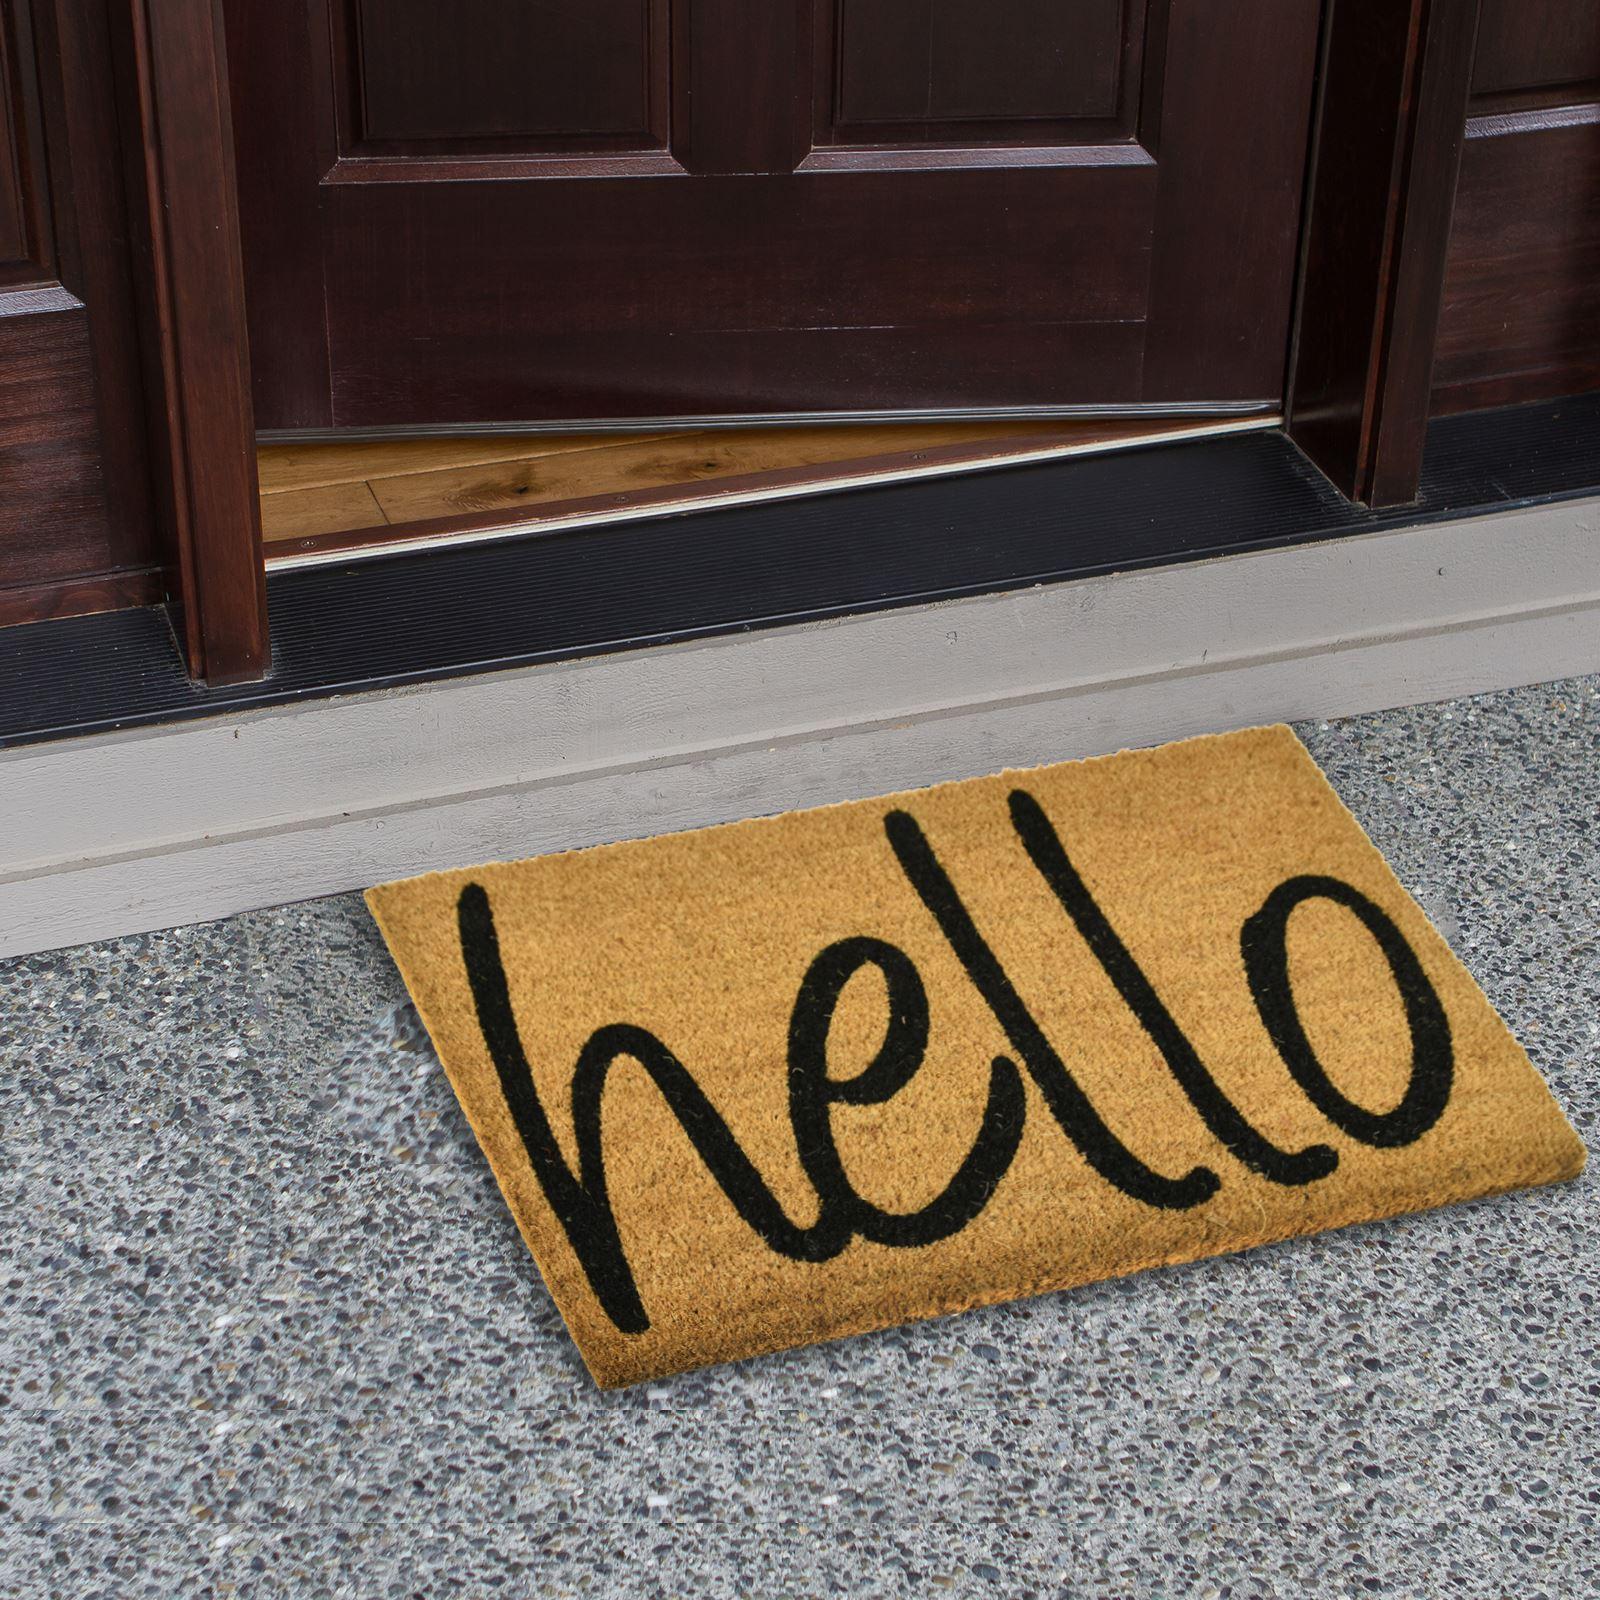 Plain-Non-Slip-Door-Mat-Tough-Natural-Coir-PVC-Back-Welcome-Doormat-40-x-60cm miniatura 59